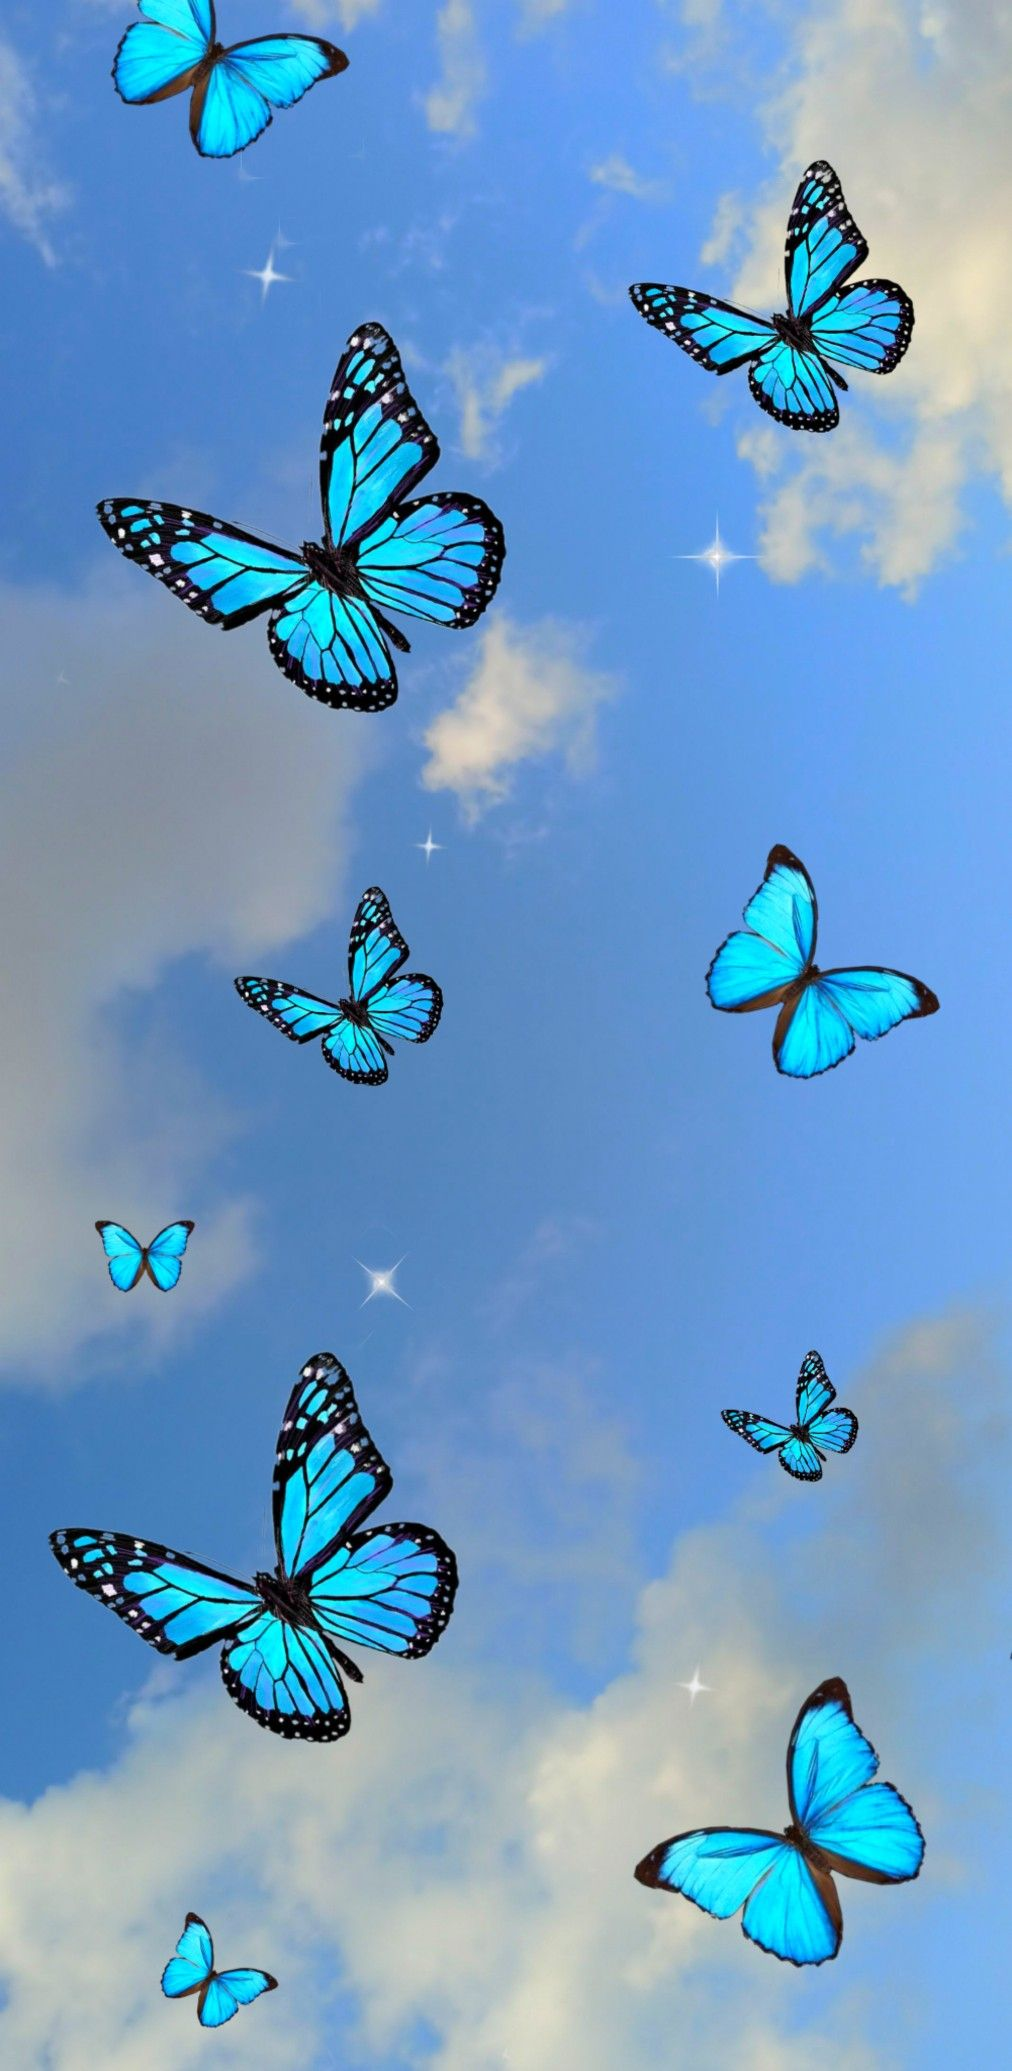 Butterfly wallpaper em 2020 Imagem de fundo para iphone